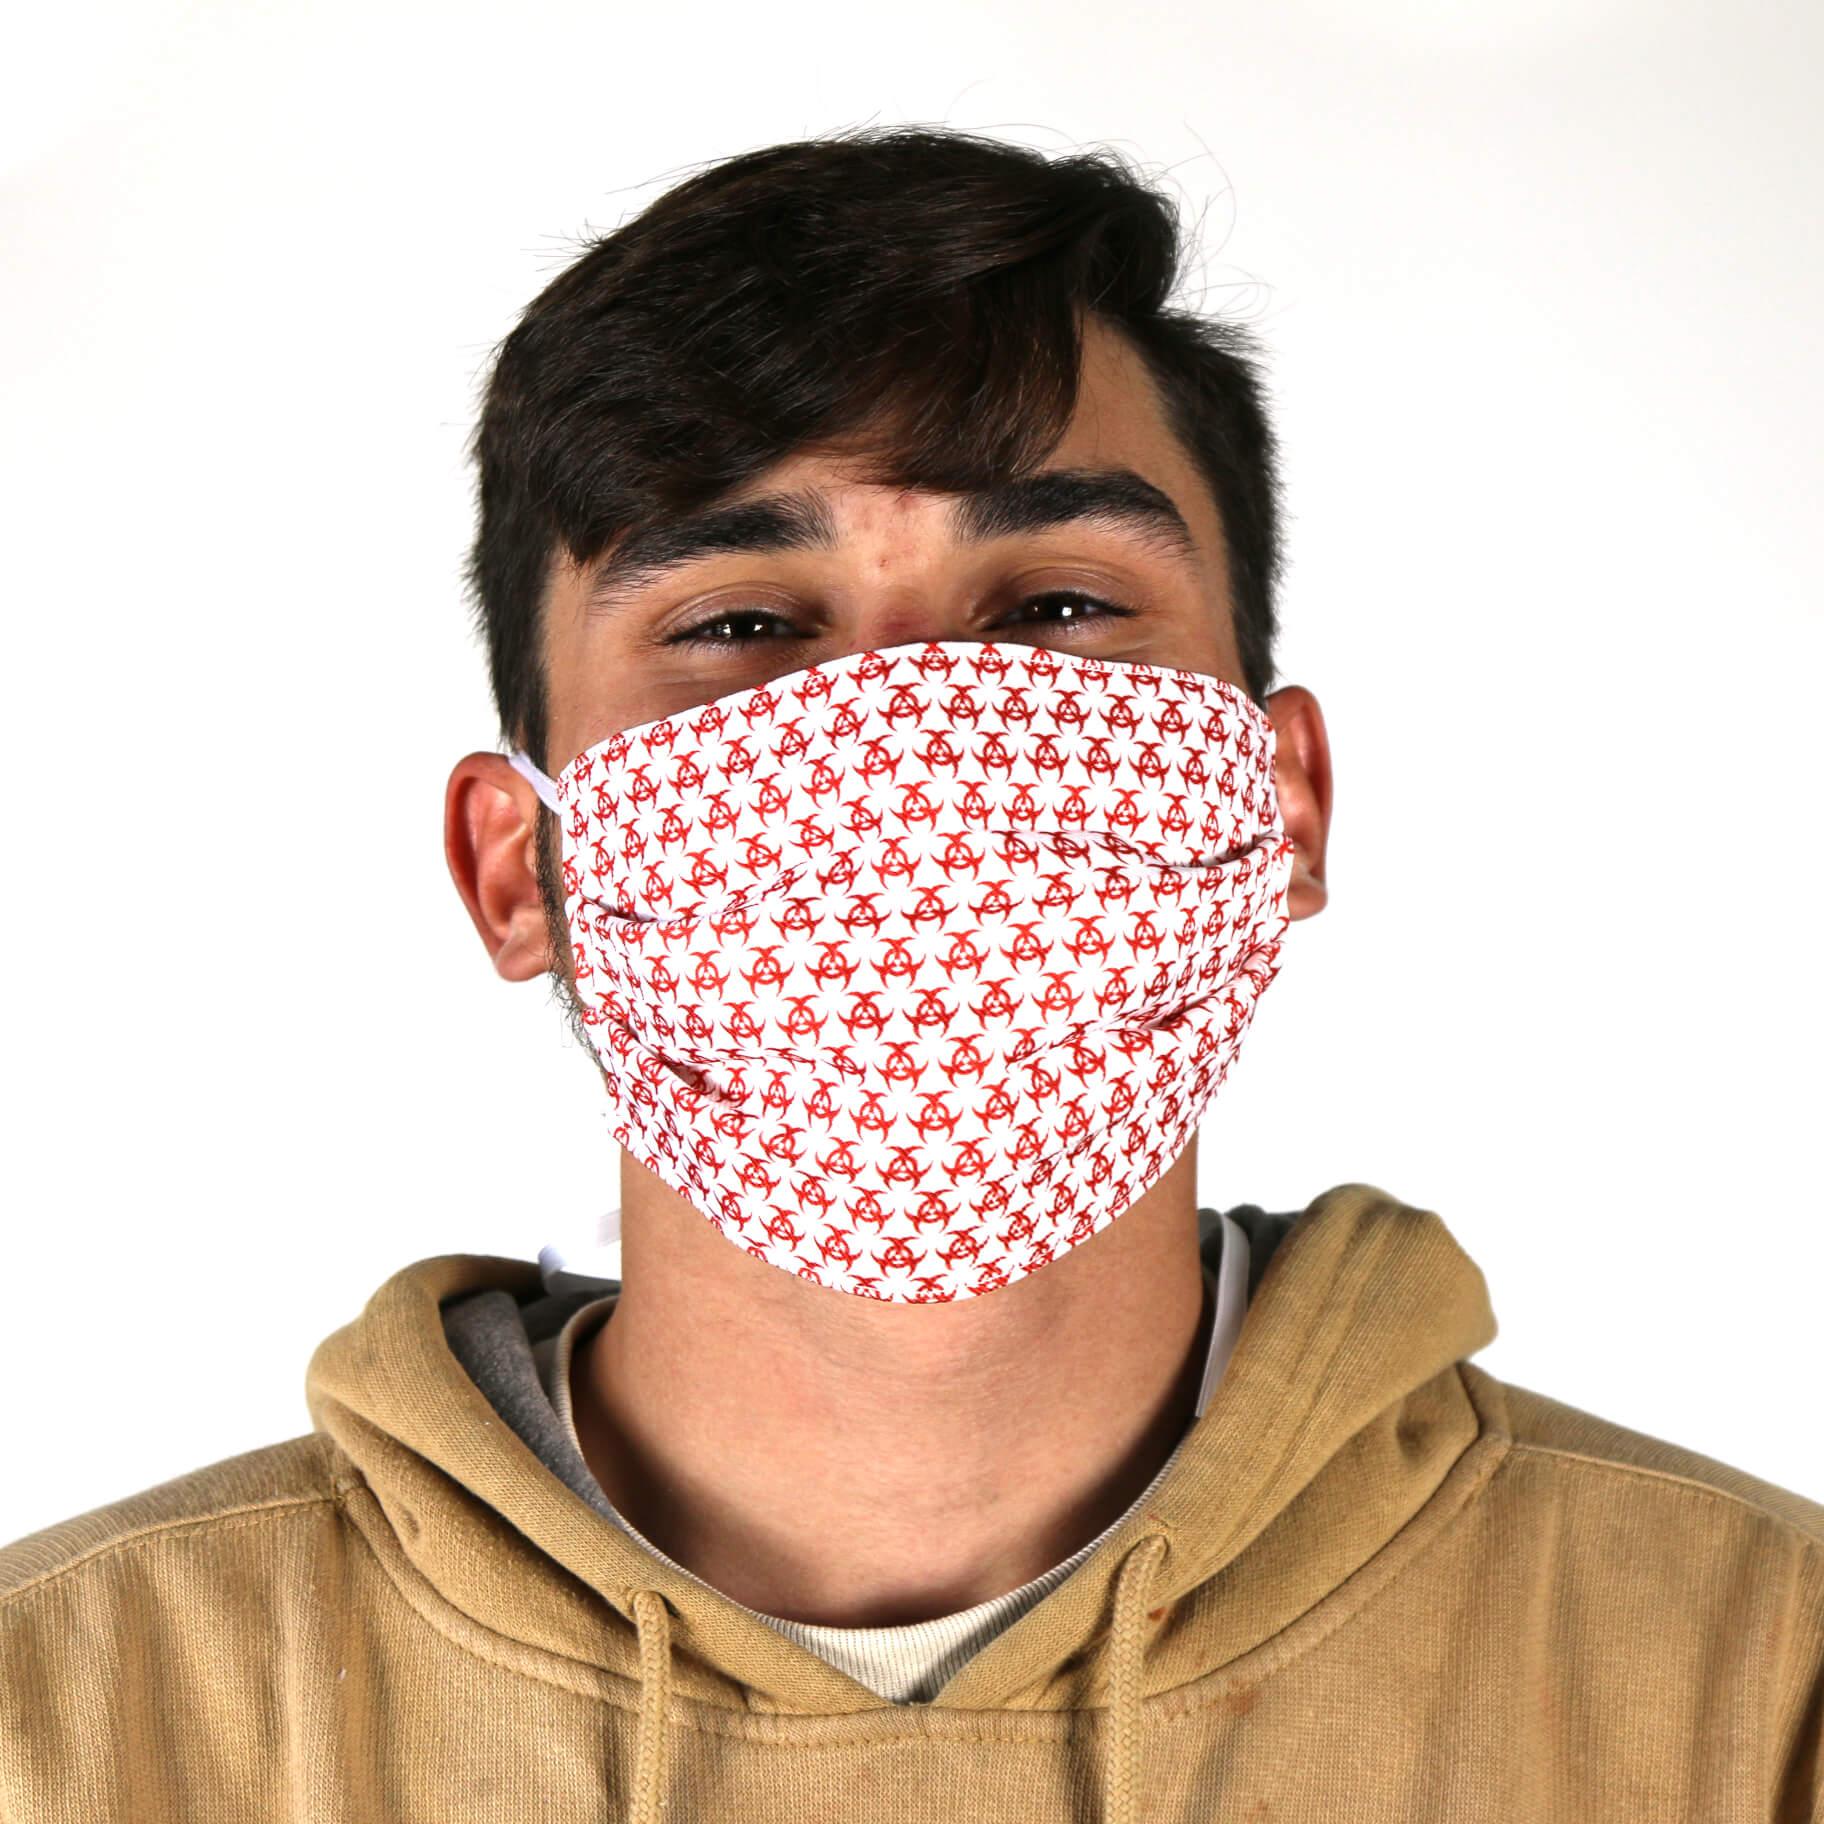 Bio-Hazard Wallpaper Face Mask